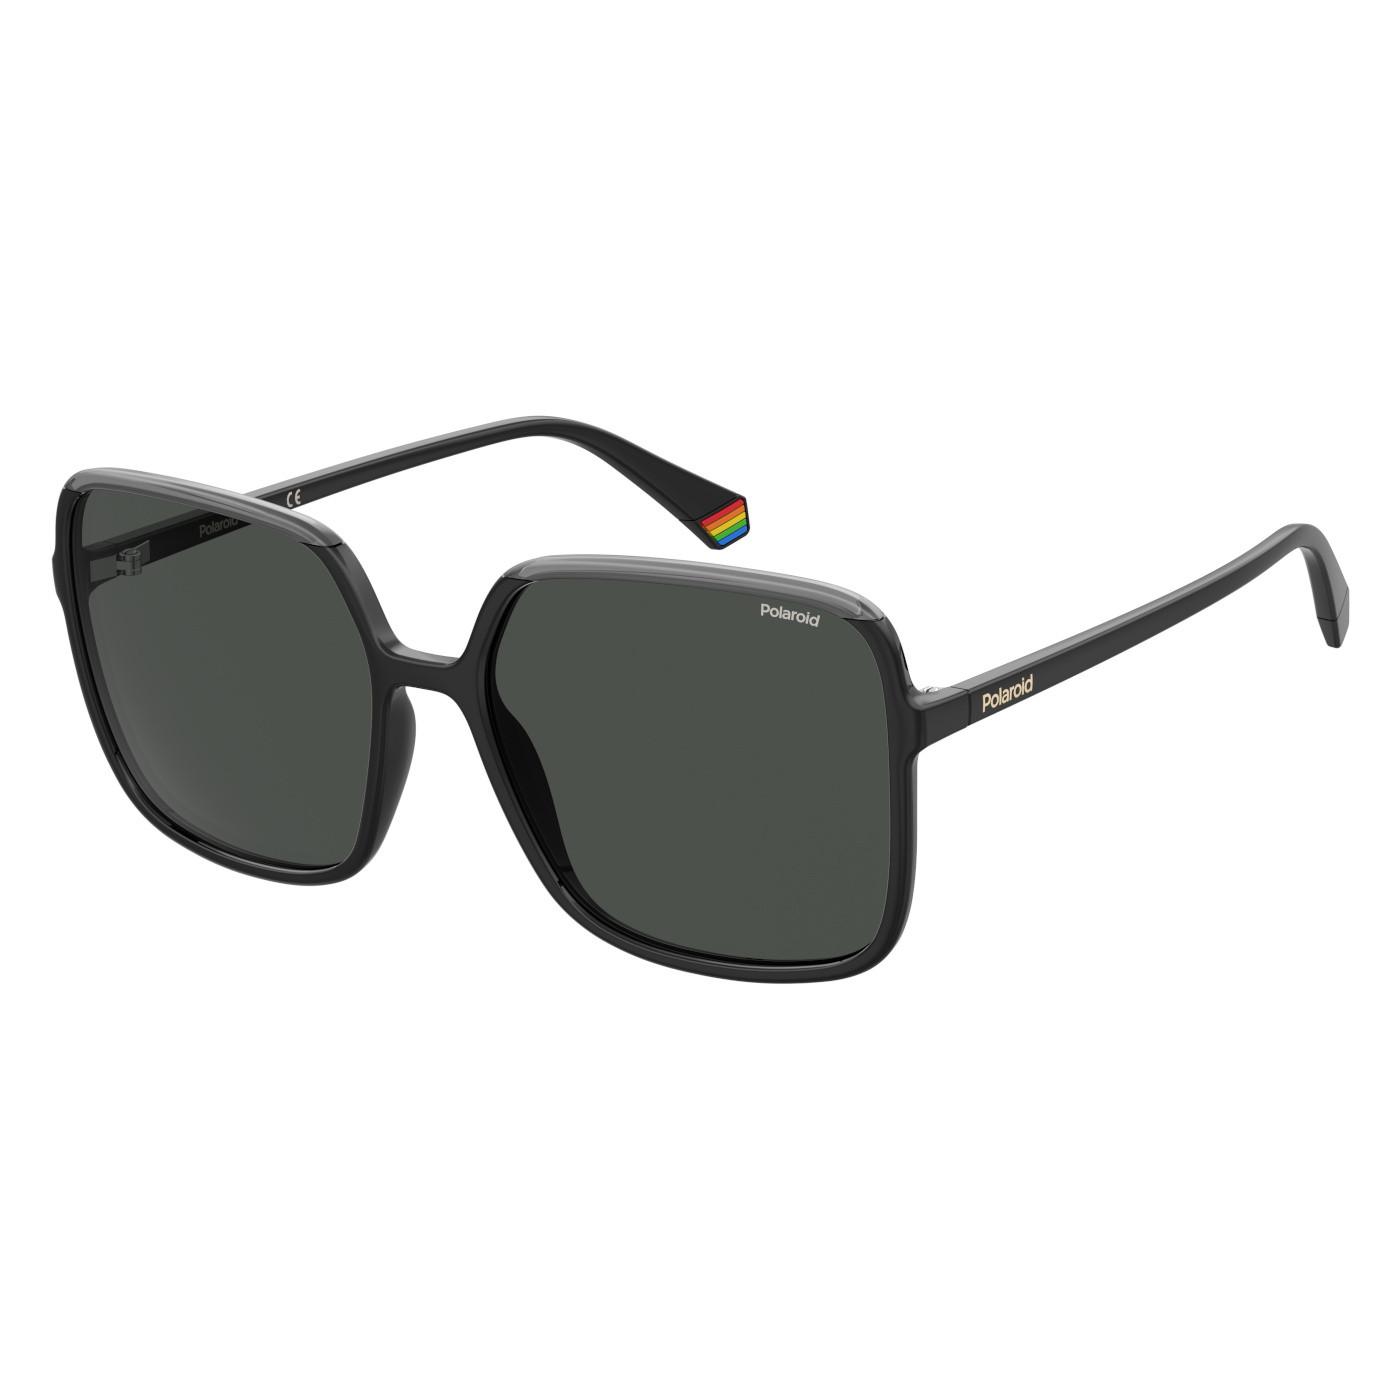 Polaroid Black Grey Zonnebril PLD-6128S-08A-59-M9